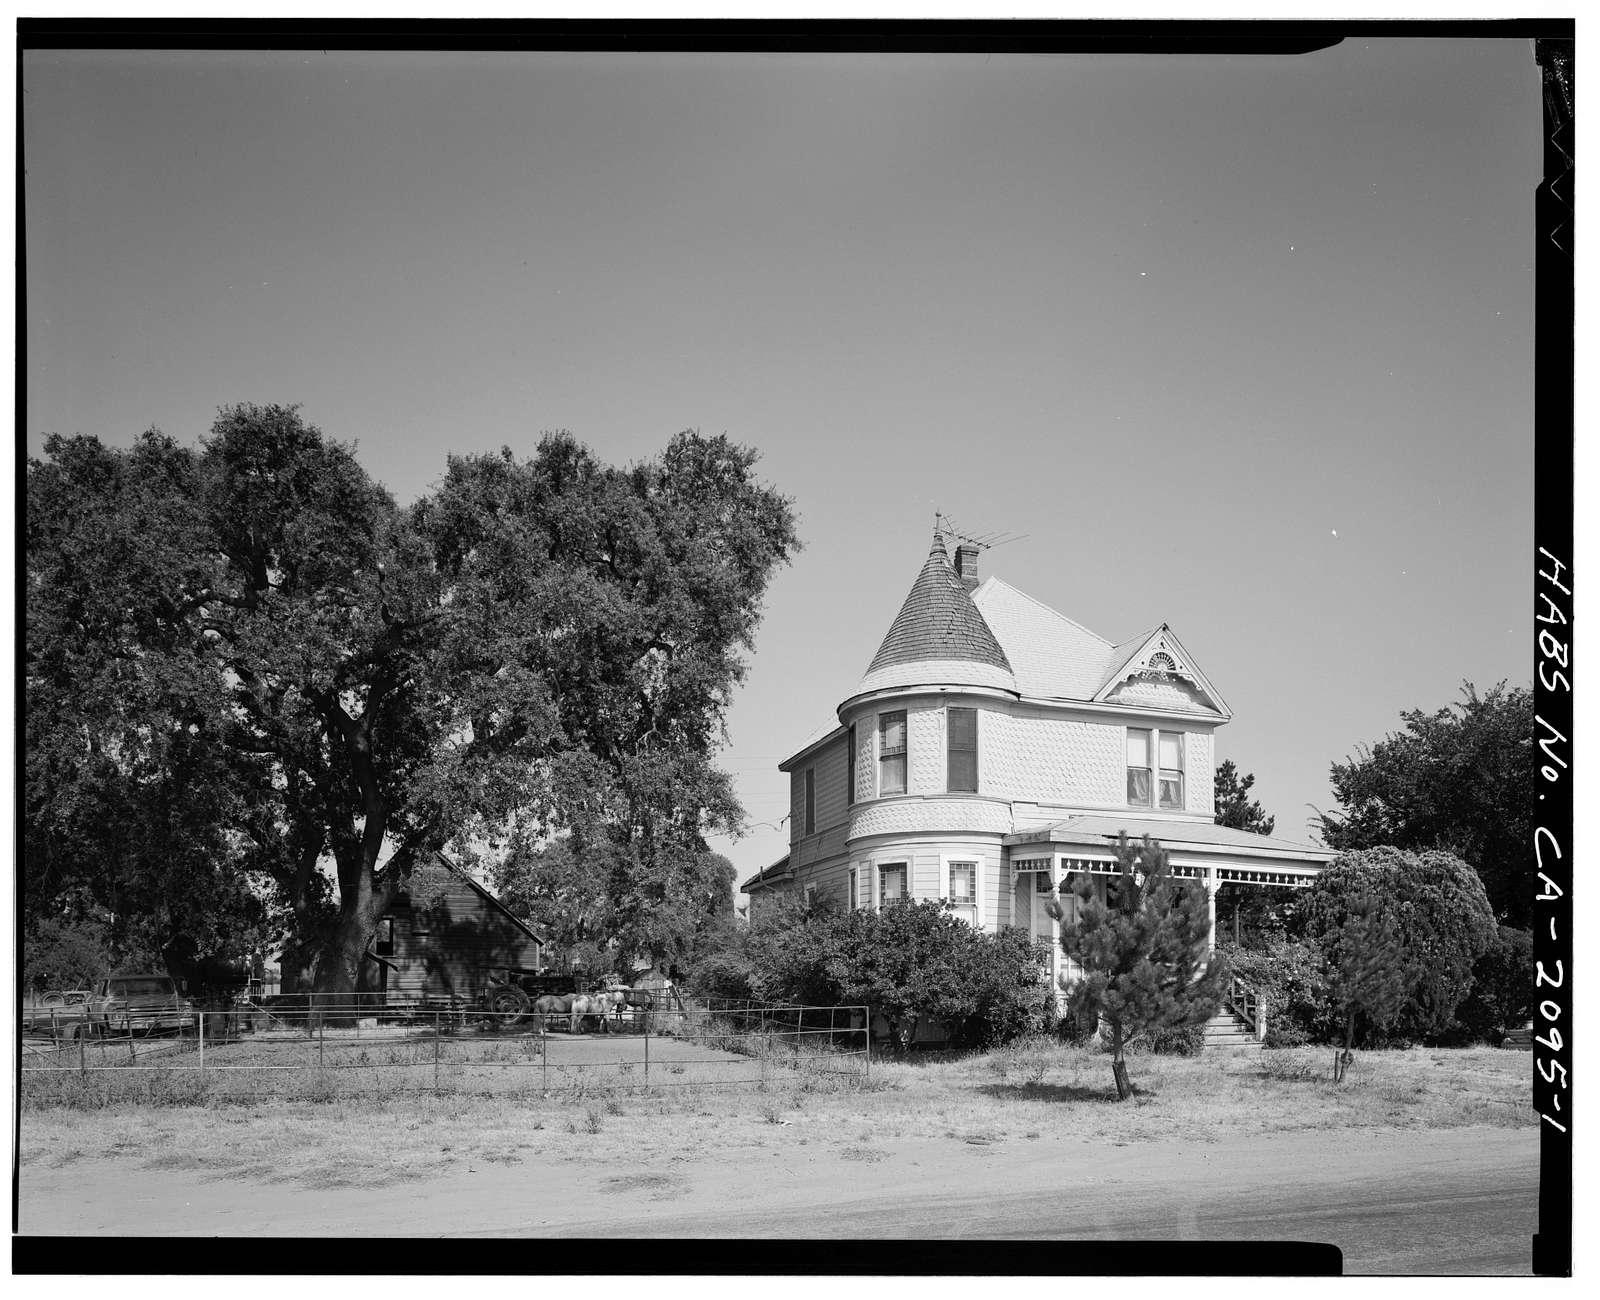 Hoenck House, 9480 Murray Avenue, Gilroy, Santa Clara County, CA